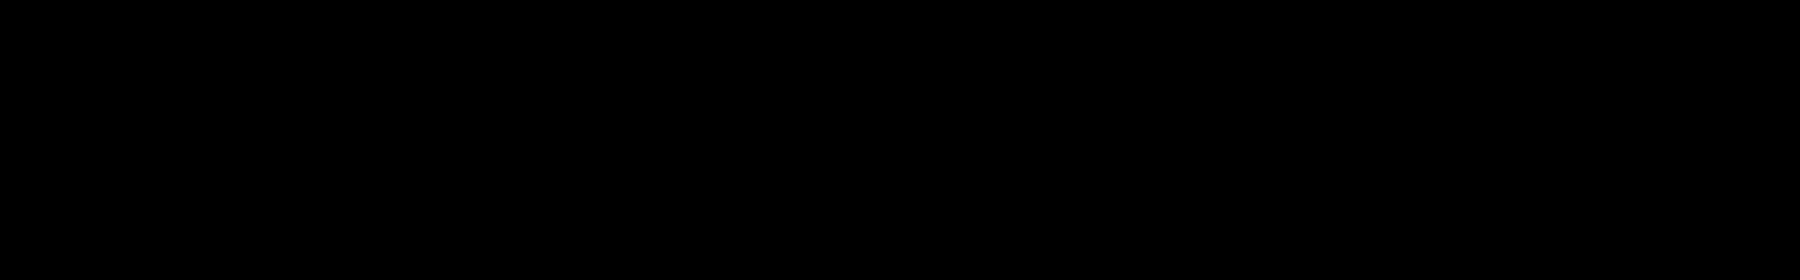 AudioKaviar 01: Indie Pop & Electronica for Ableton Live 10 audio waveform